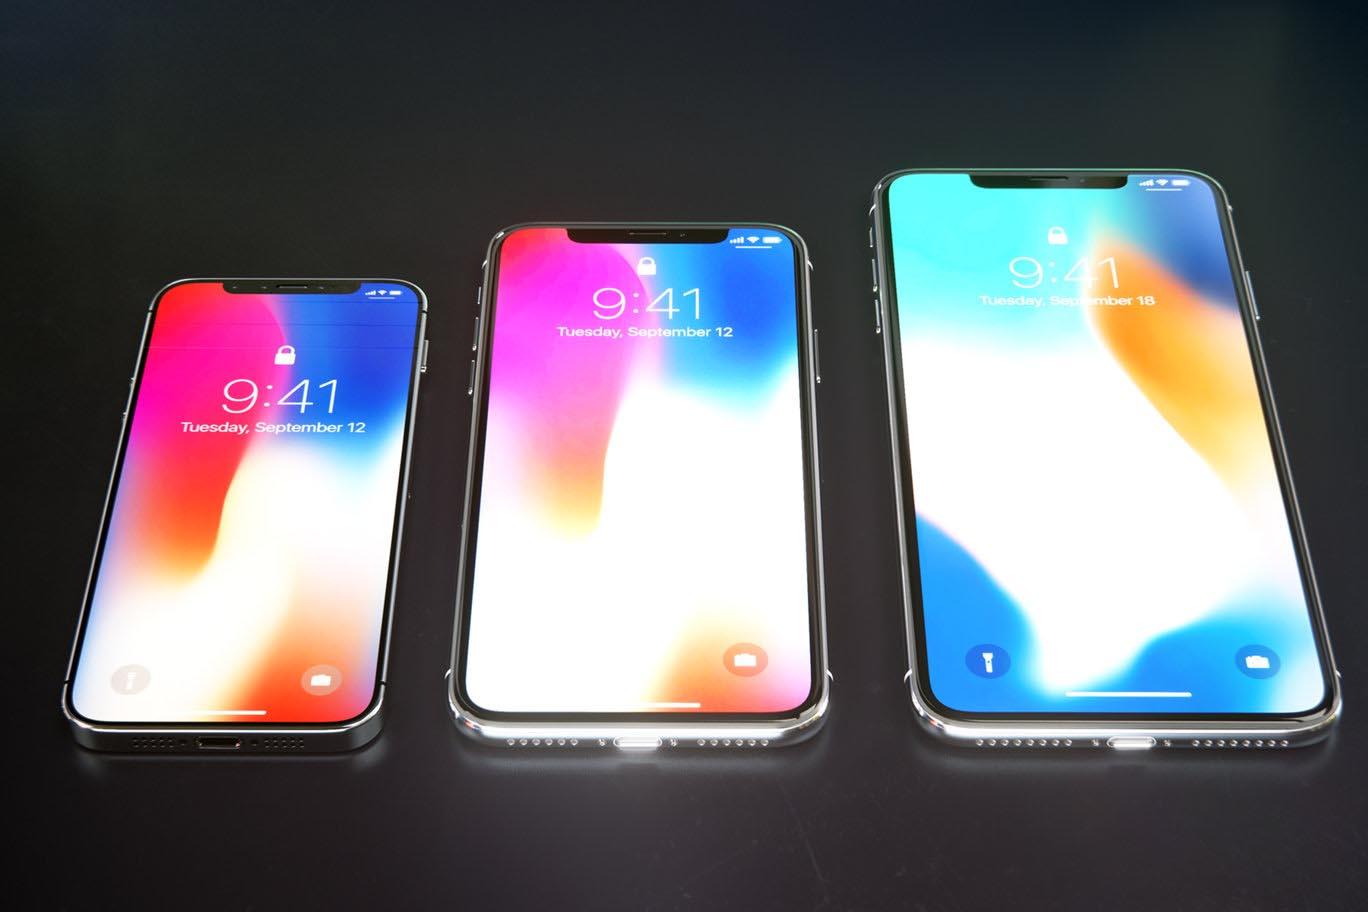 Concept iPhone SE Face ID